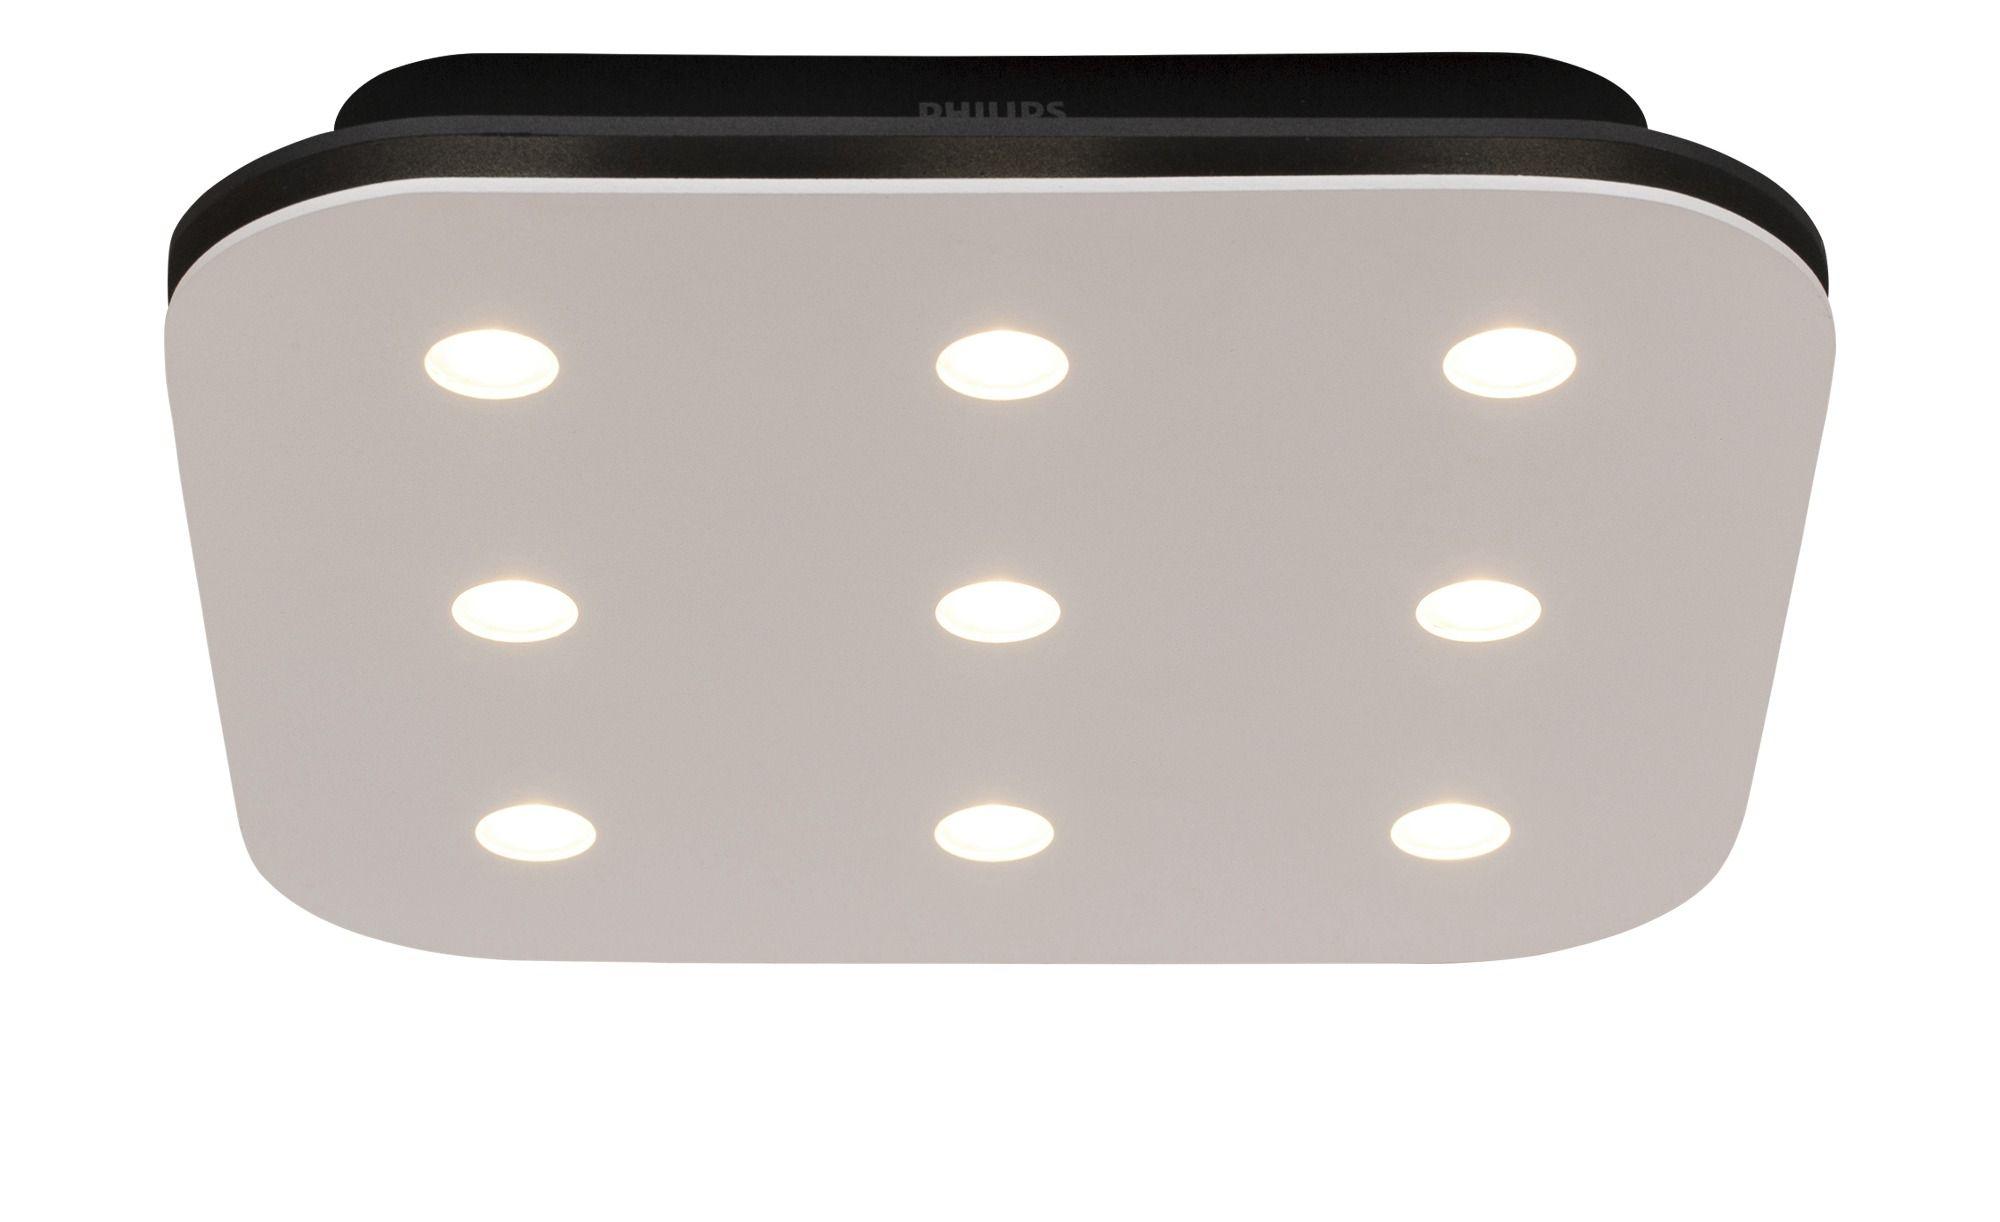 Philips Lampen Led : Philips led deckenlampe metallplatte quadr. jetzt bestellen unter